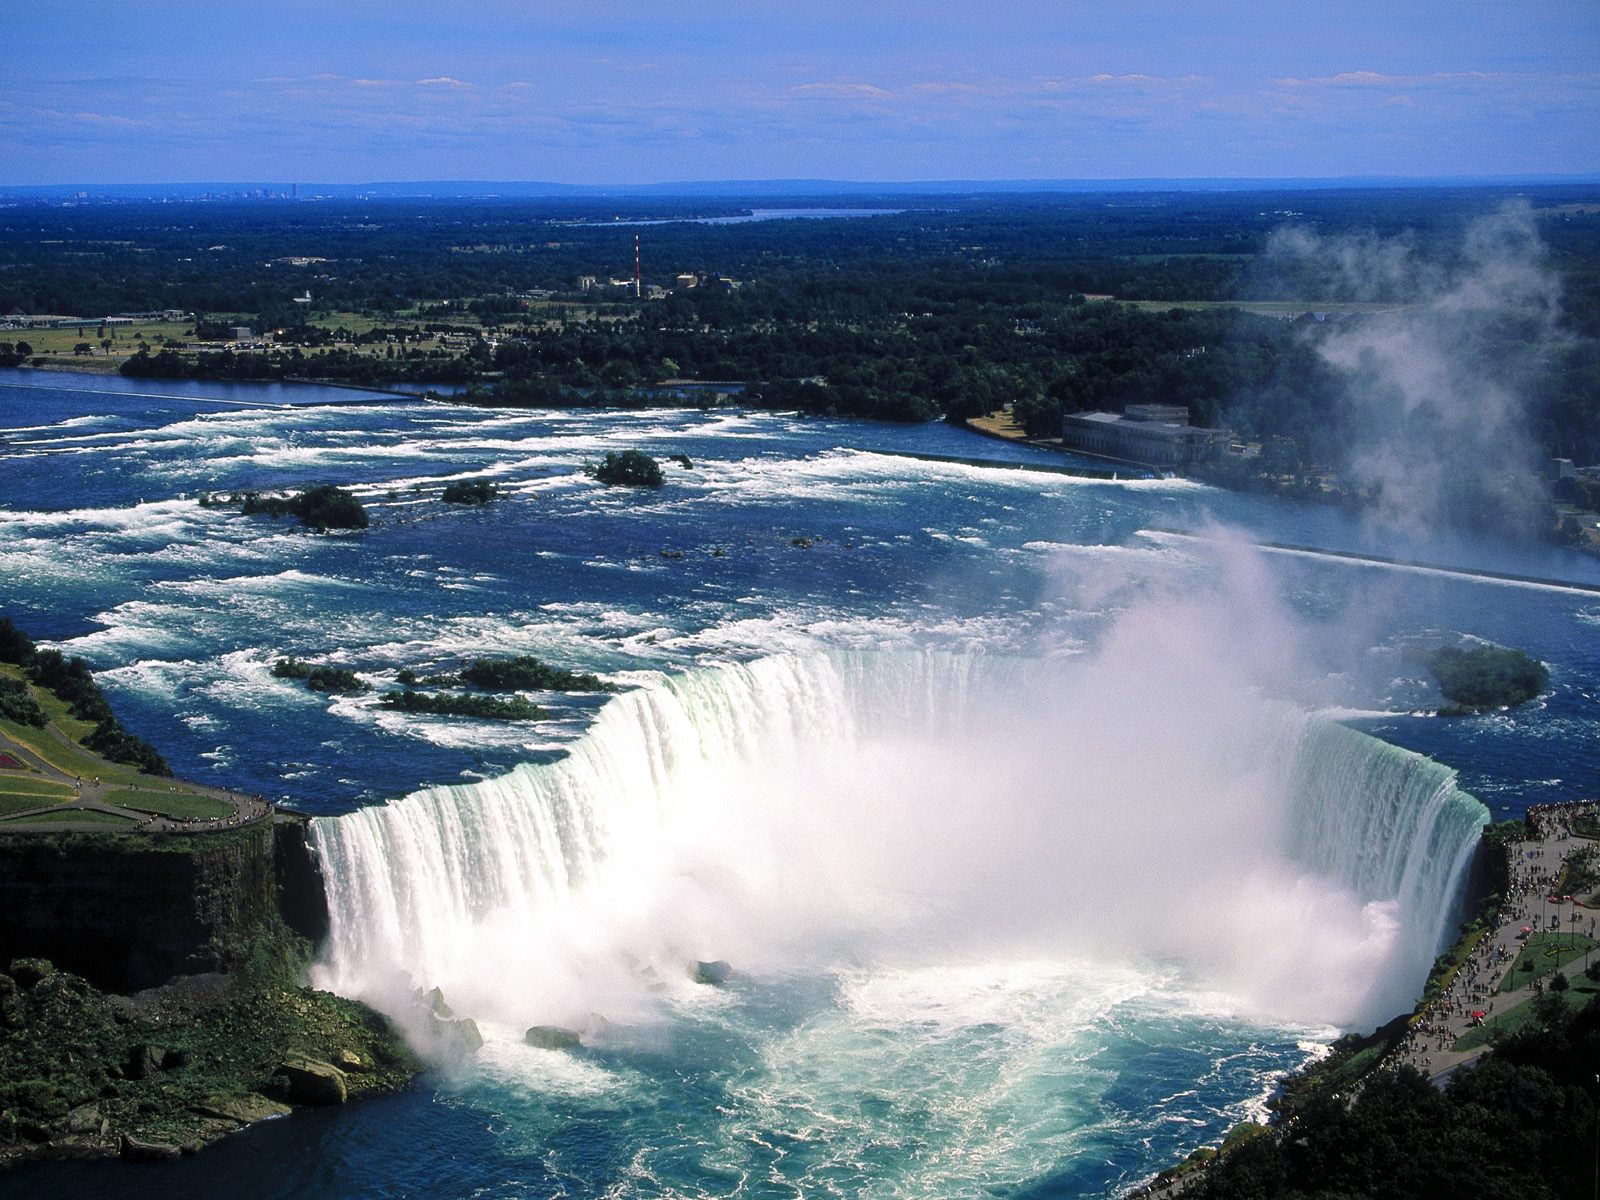 http://4.bp.blogspot.com/-qIegvJtLuuw/TdKEwSOAdcI/AAAAAAAACUw/bJsOWQNj1nM/s1600/nature-wallpaper-aerial-view-of-niagara-falls-ontario-canada.jpg